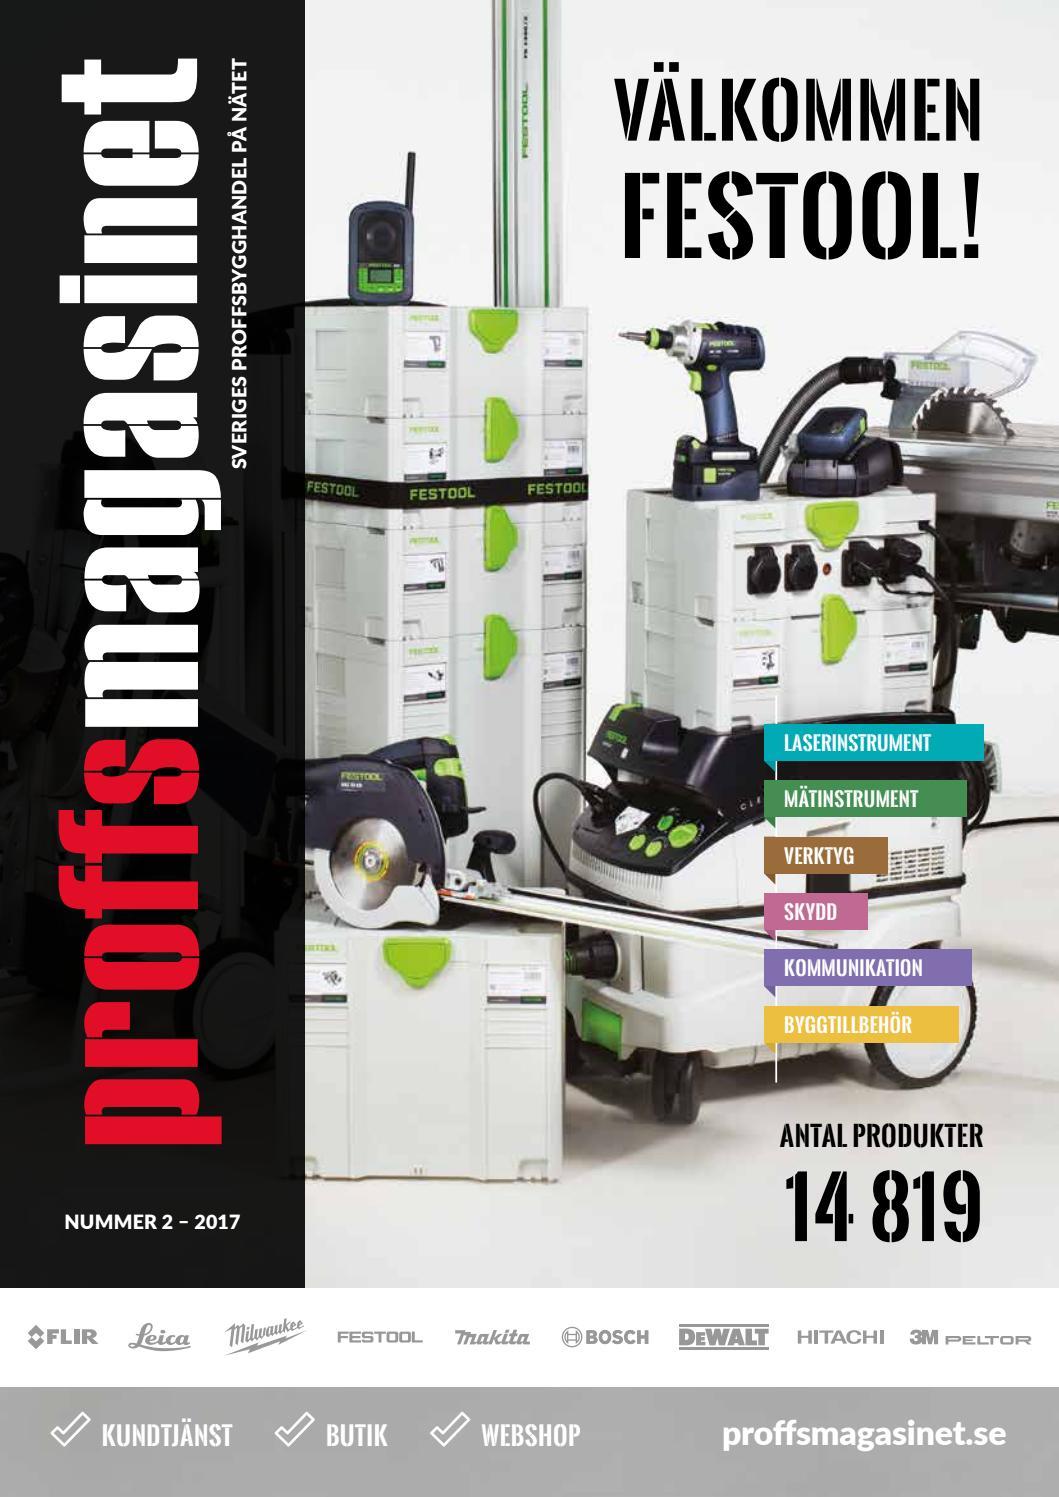 Inredning häcksax test : Proffsmagasinets katalog nr 2 2017 by Proffsmagasinet.se - issuu